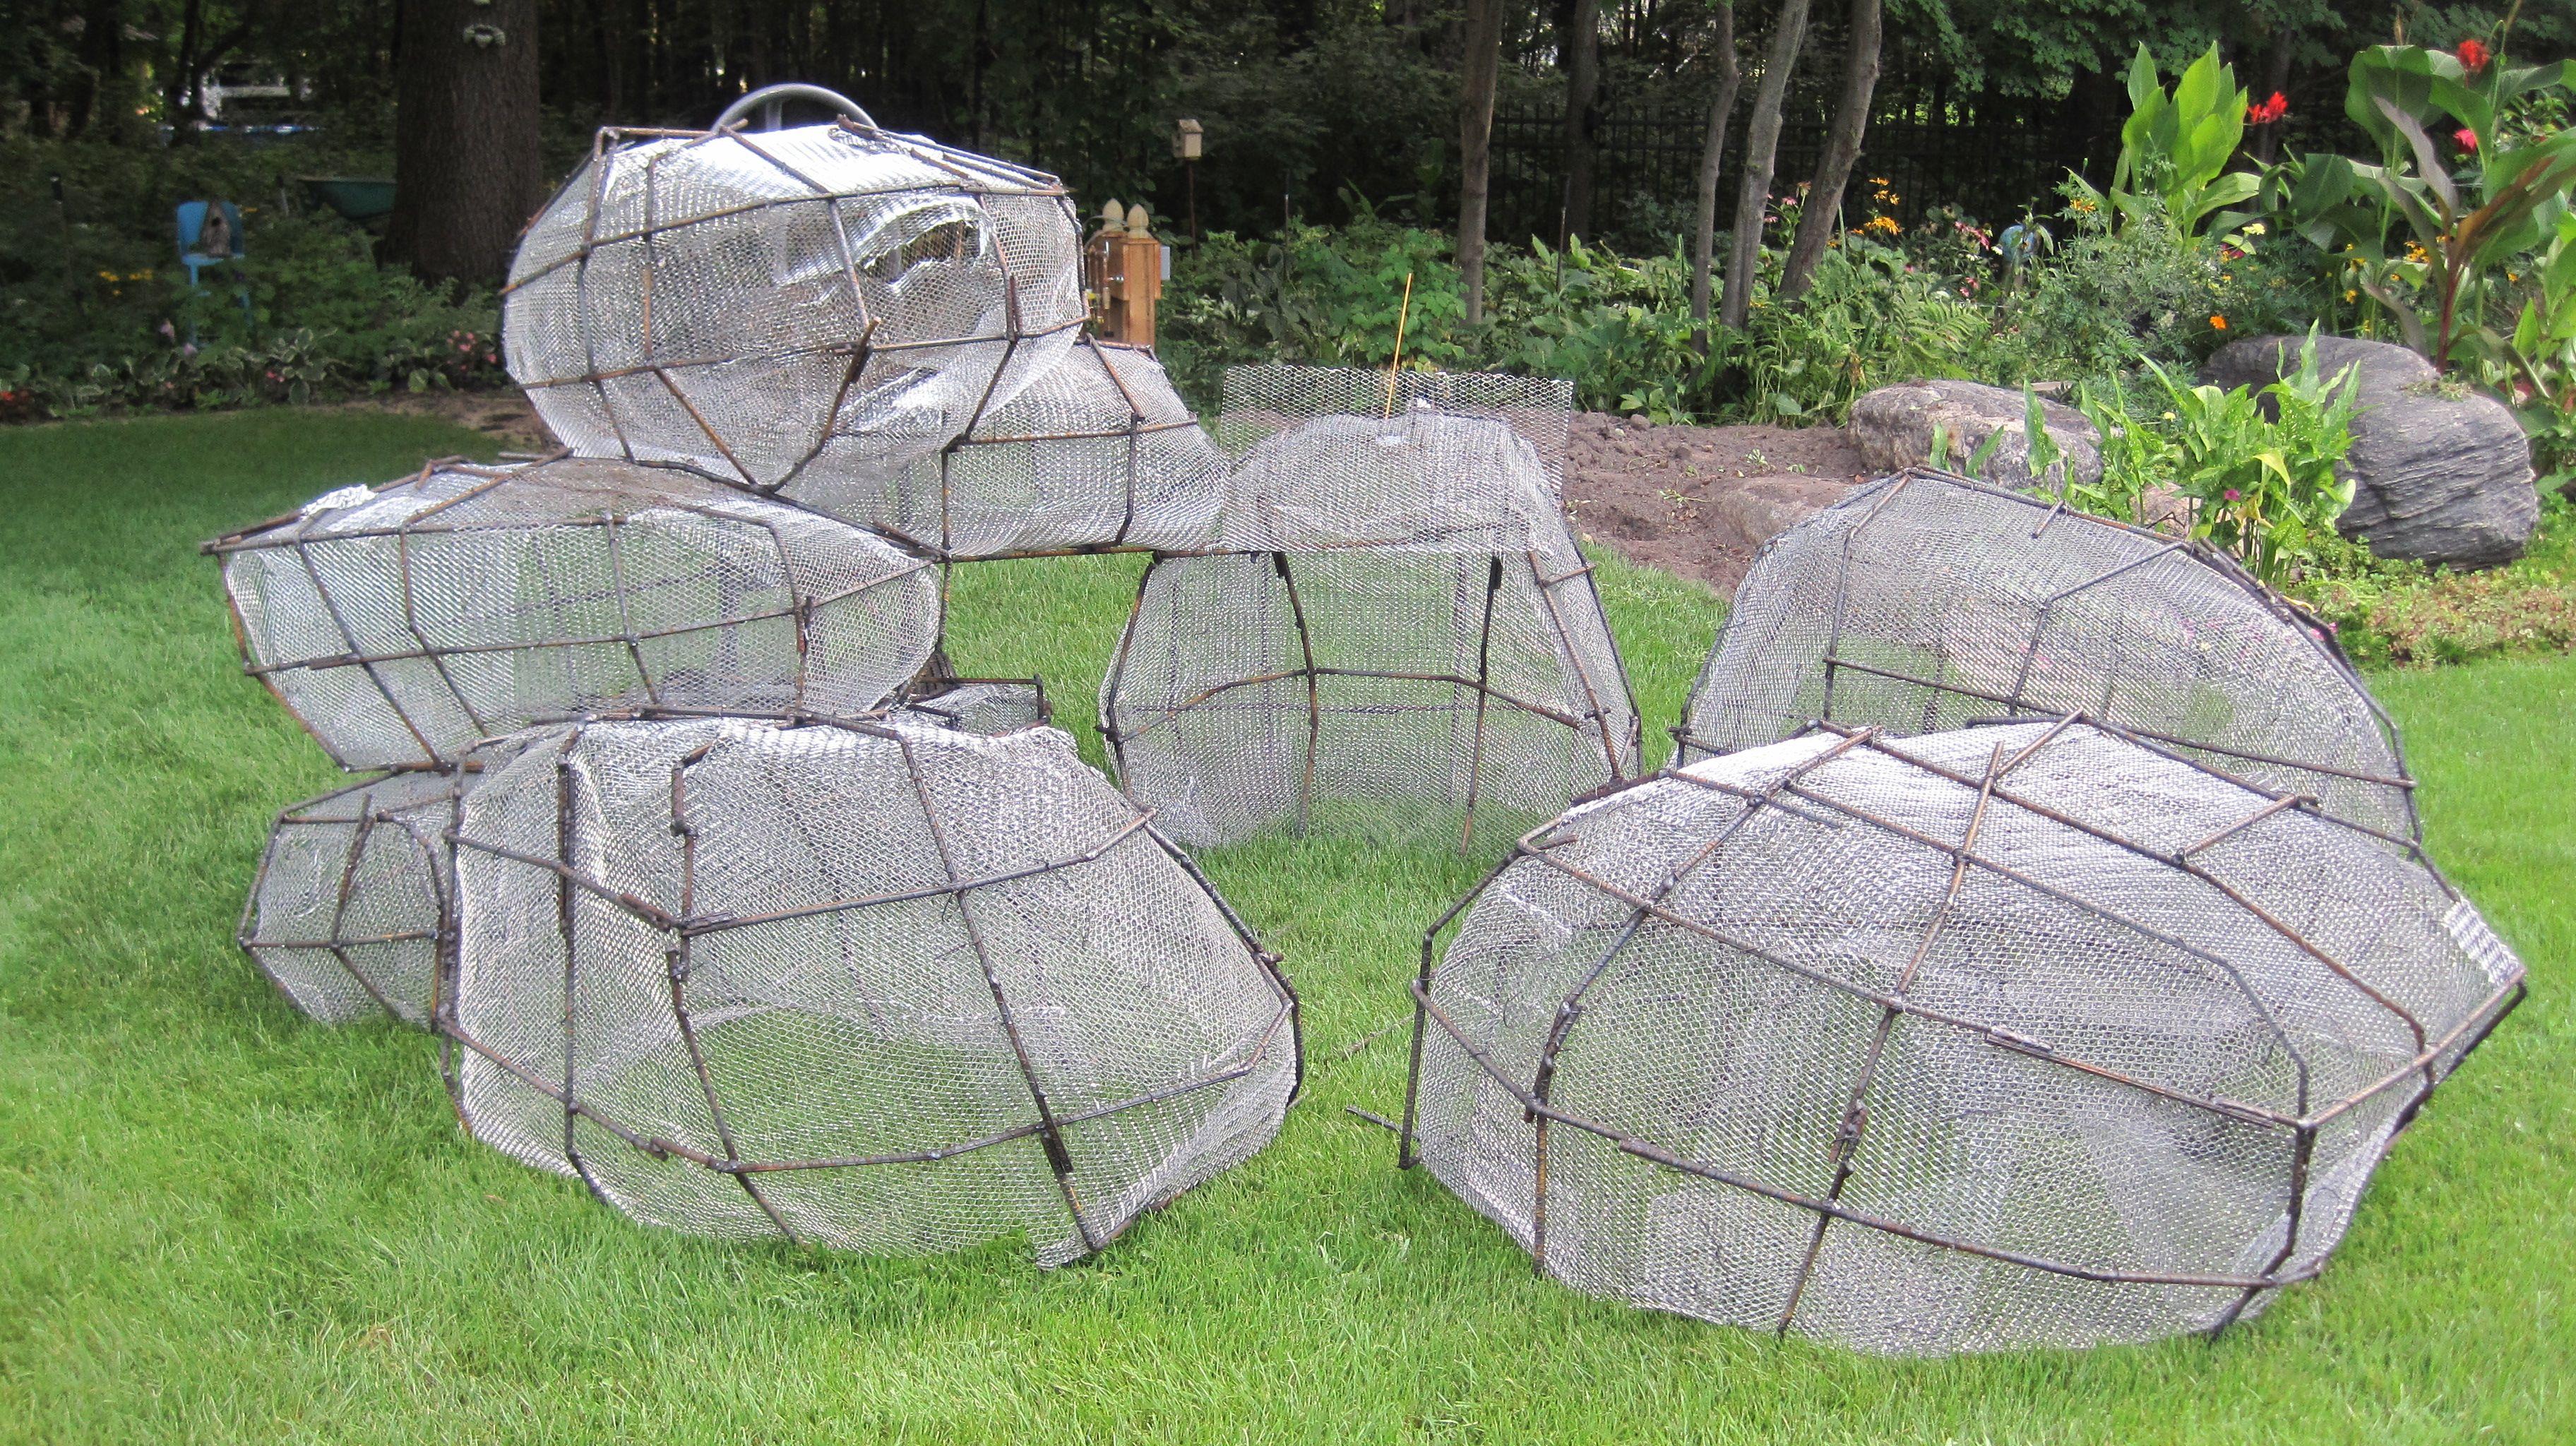 фальш камни на крышку для ямы Сделай сам Faux Rock Fake